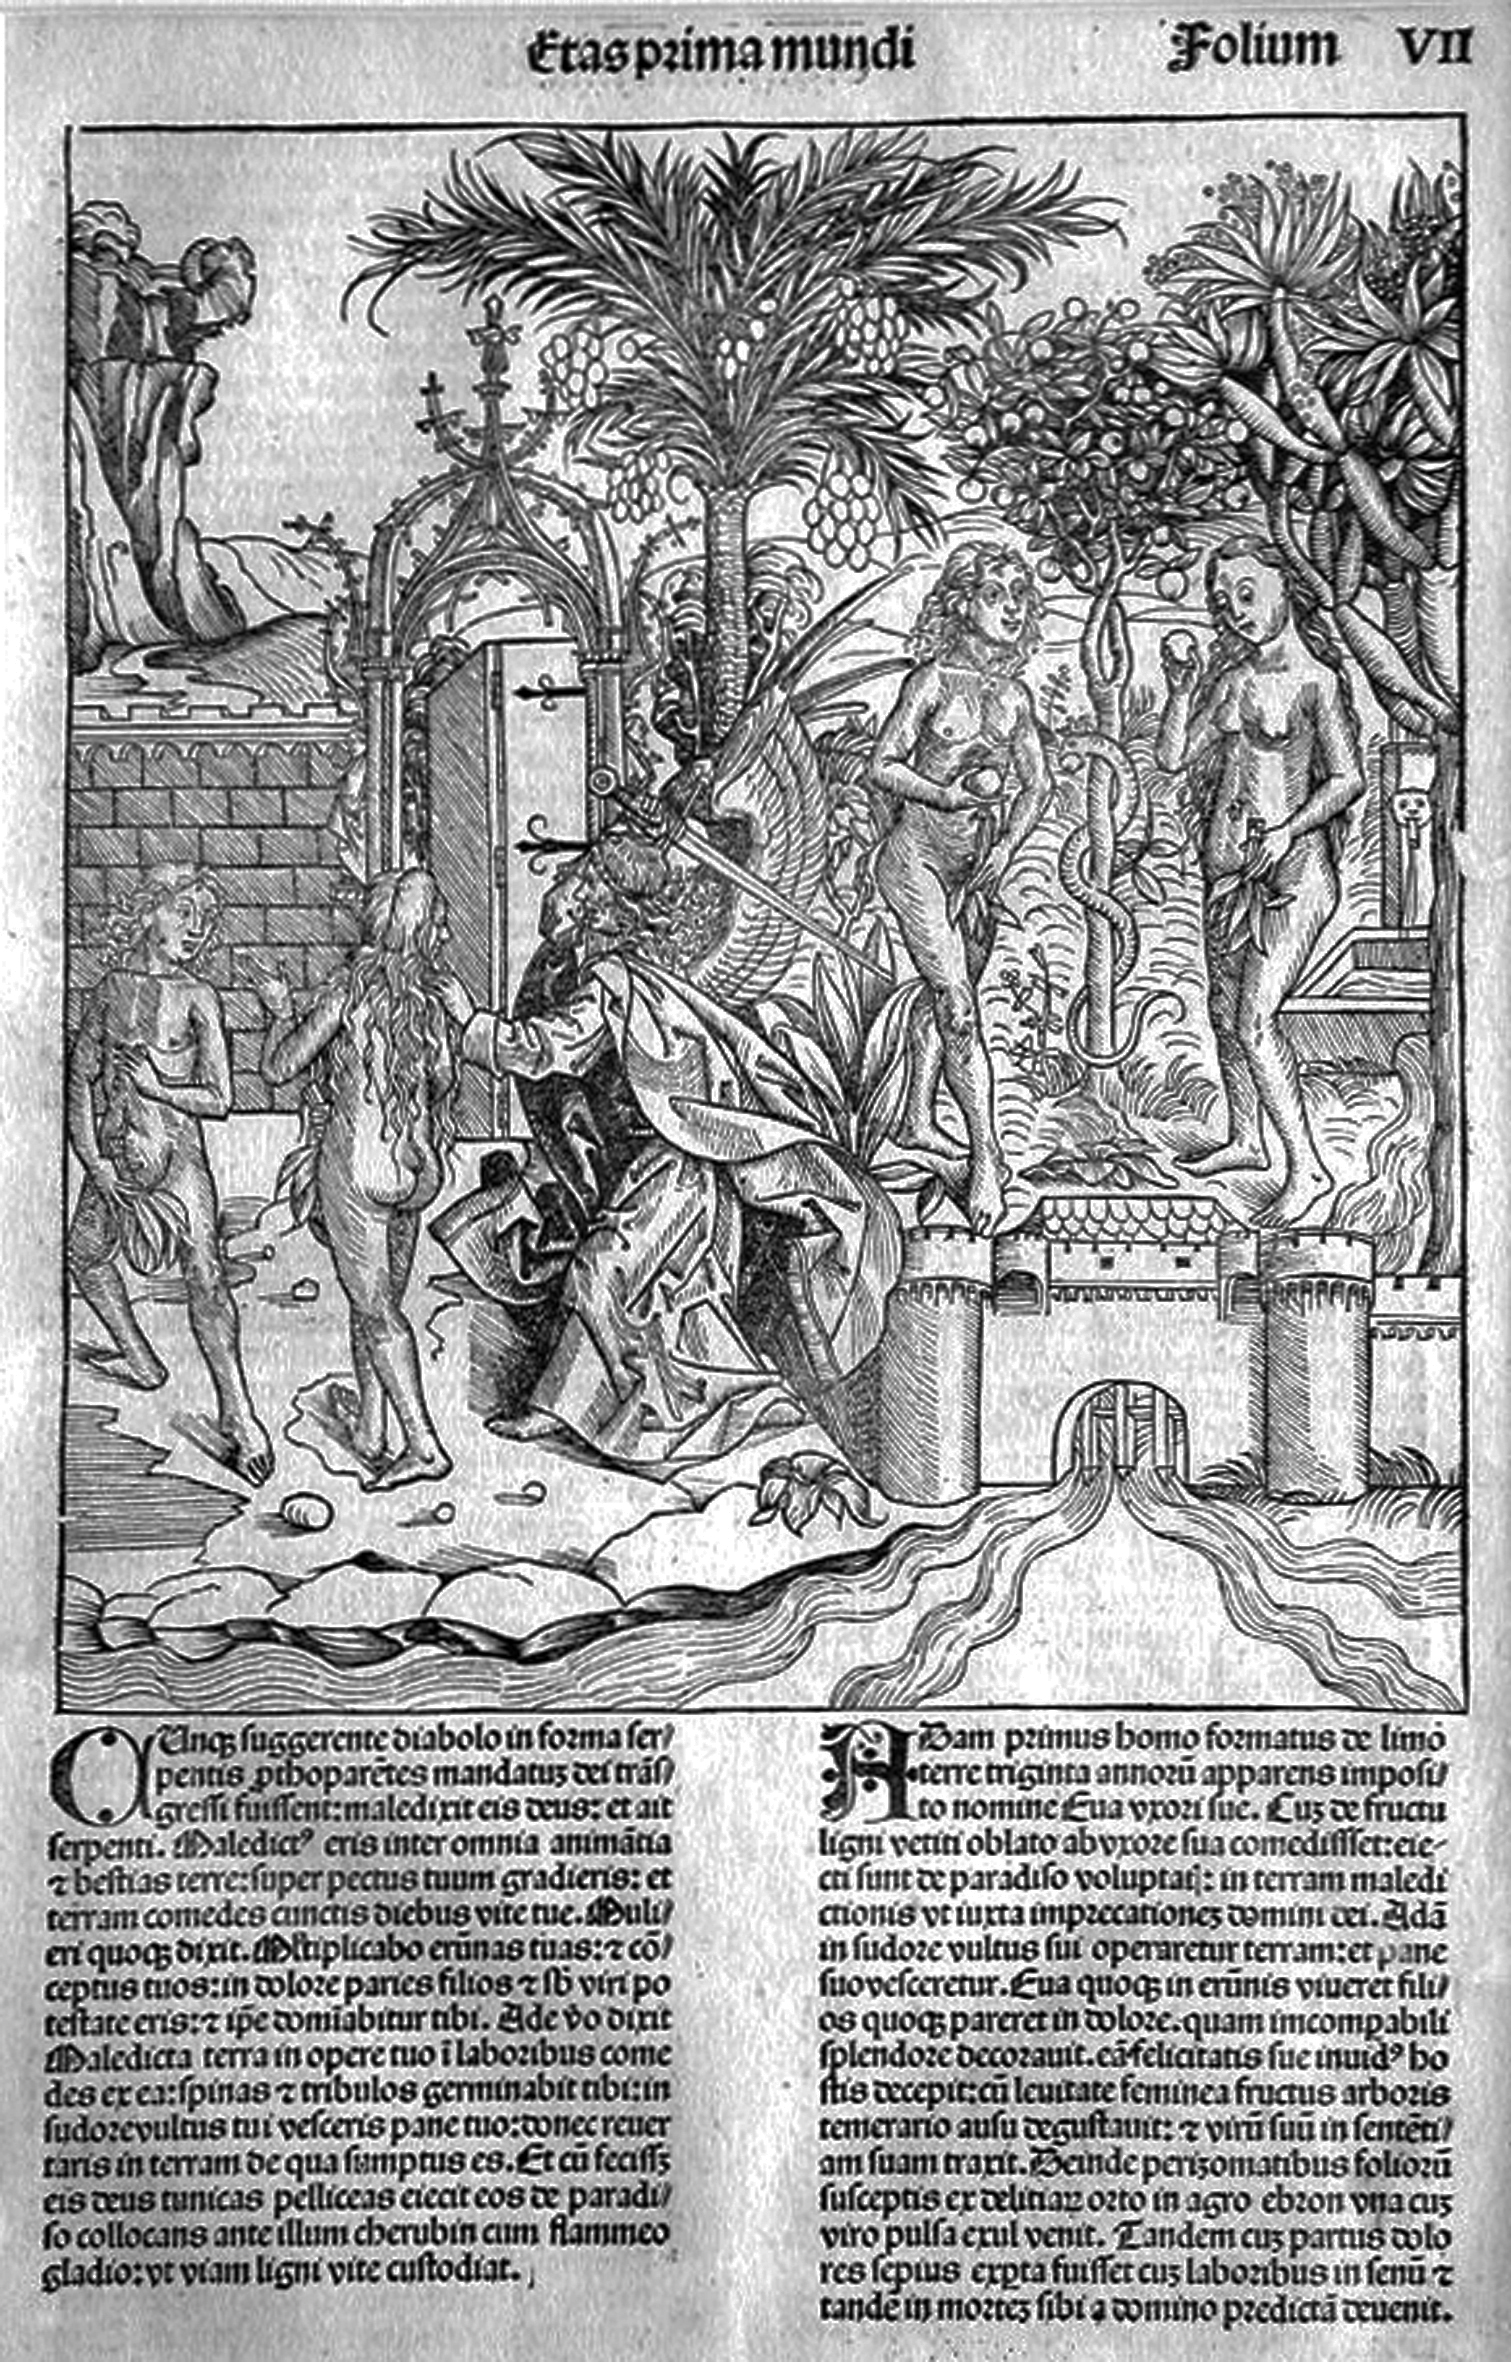 Wohlgemut; Adamo ed Eva